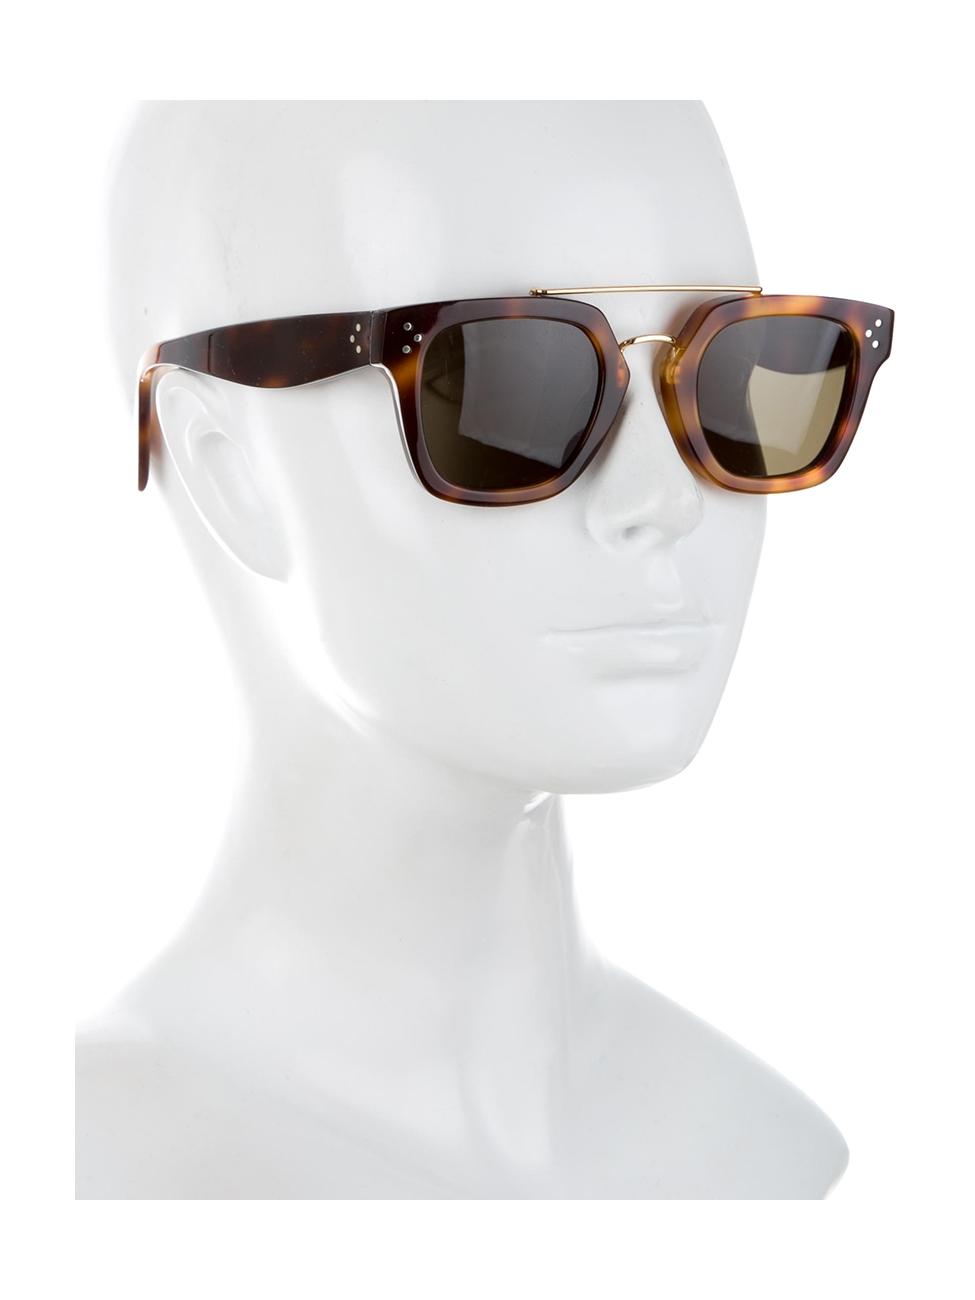 f2df0da4e3f Louise Paris - CELINE Brown tortoiseshell wayfarer bridge sunglasses Retail  price €350